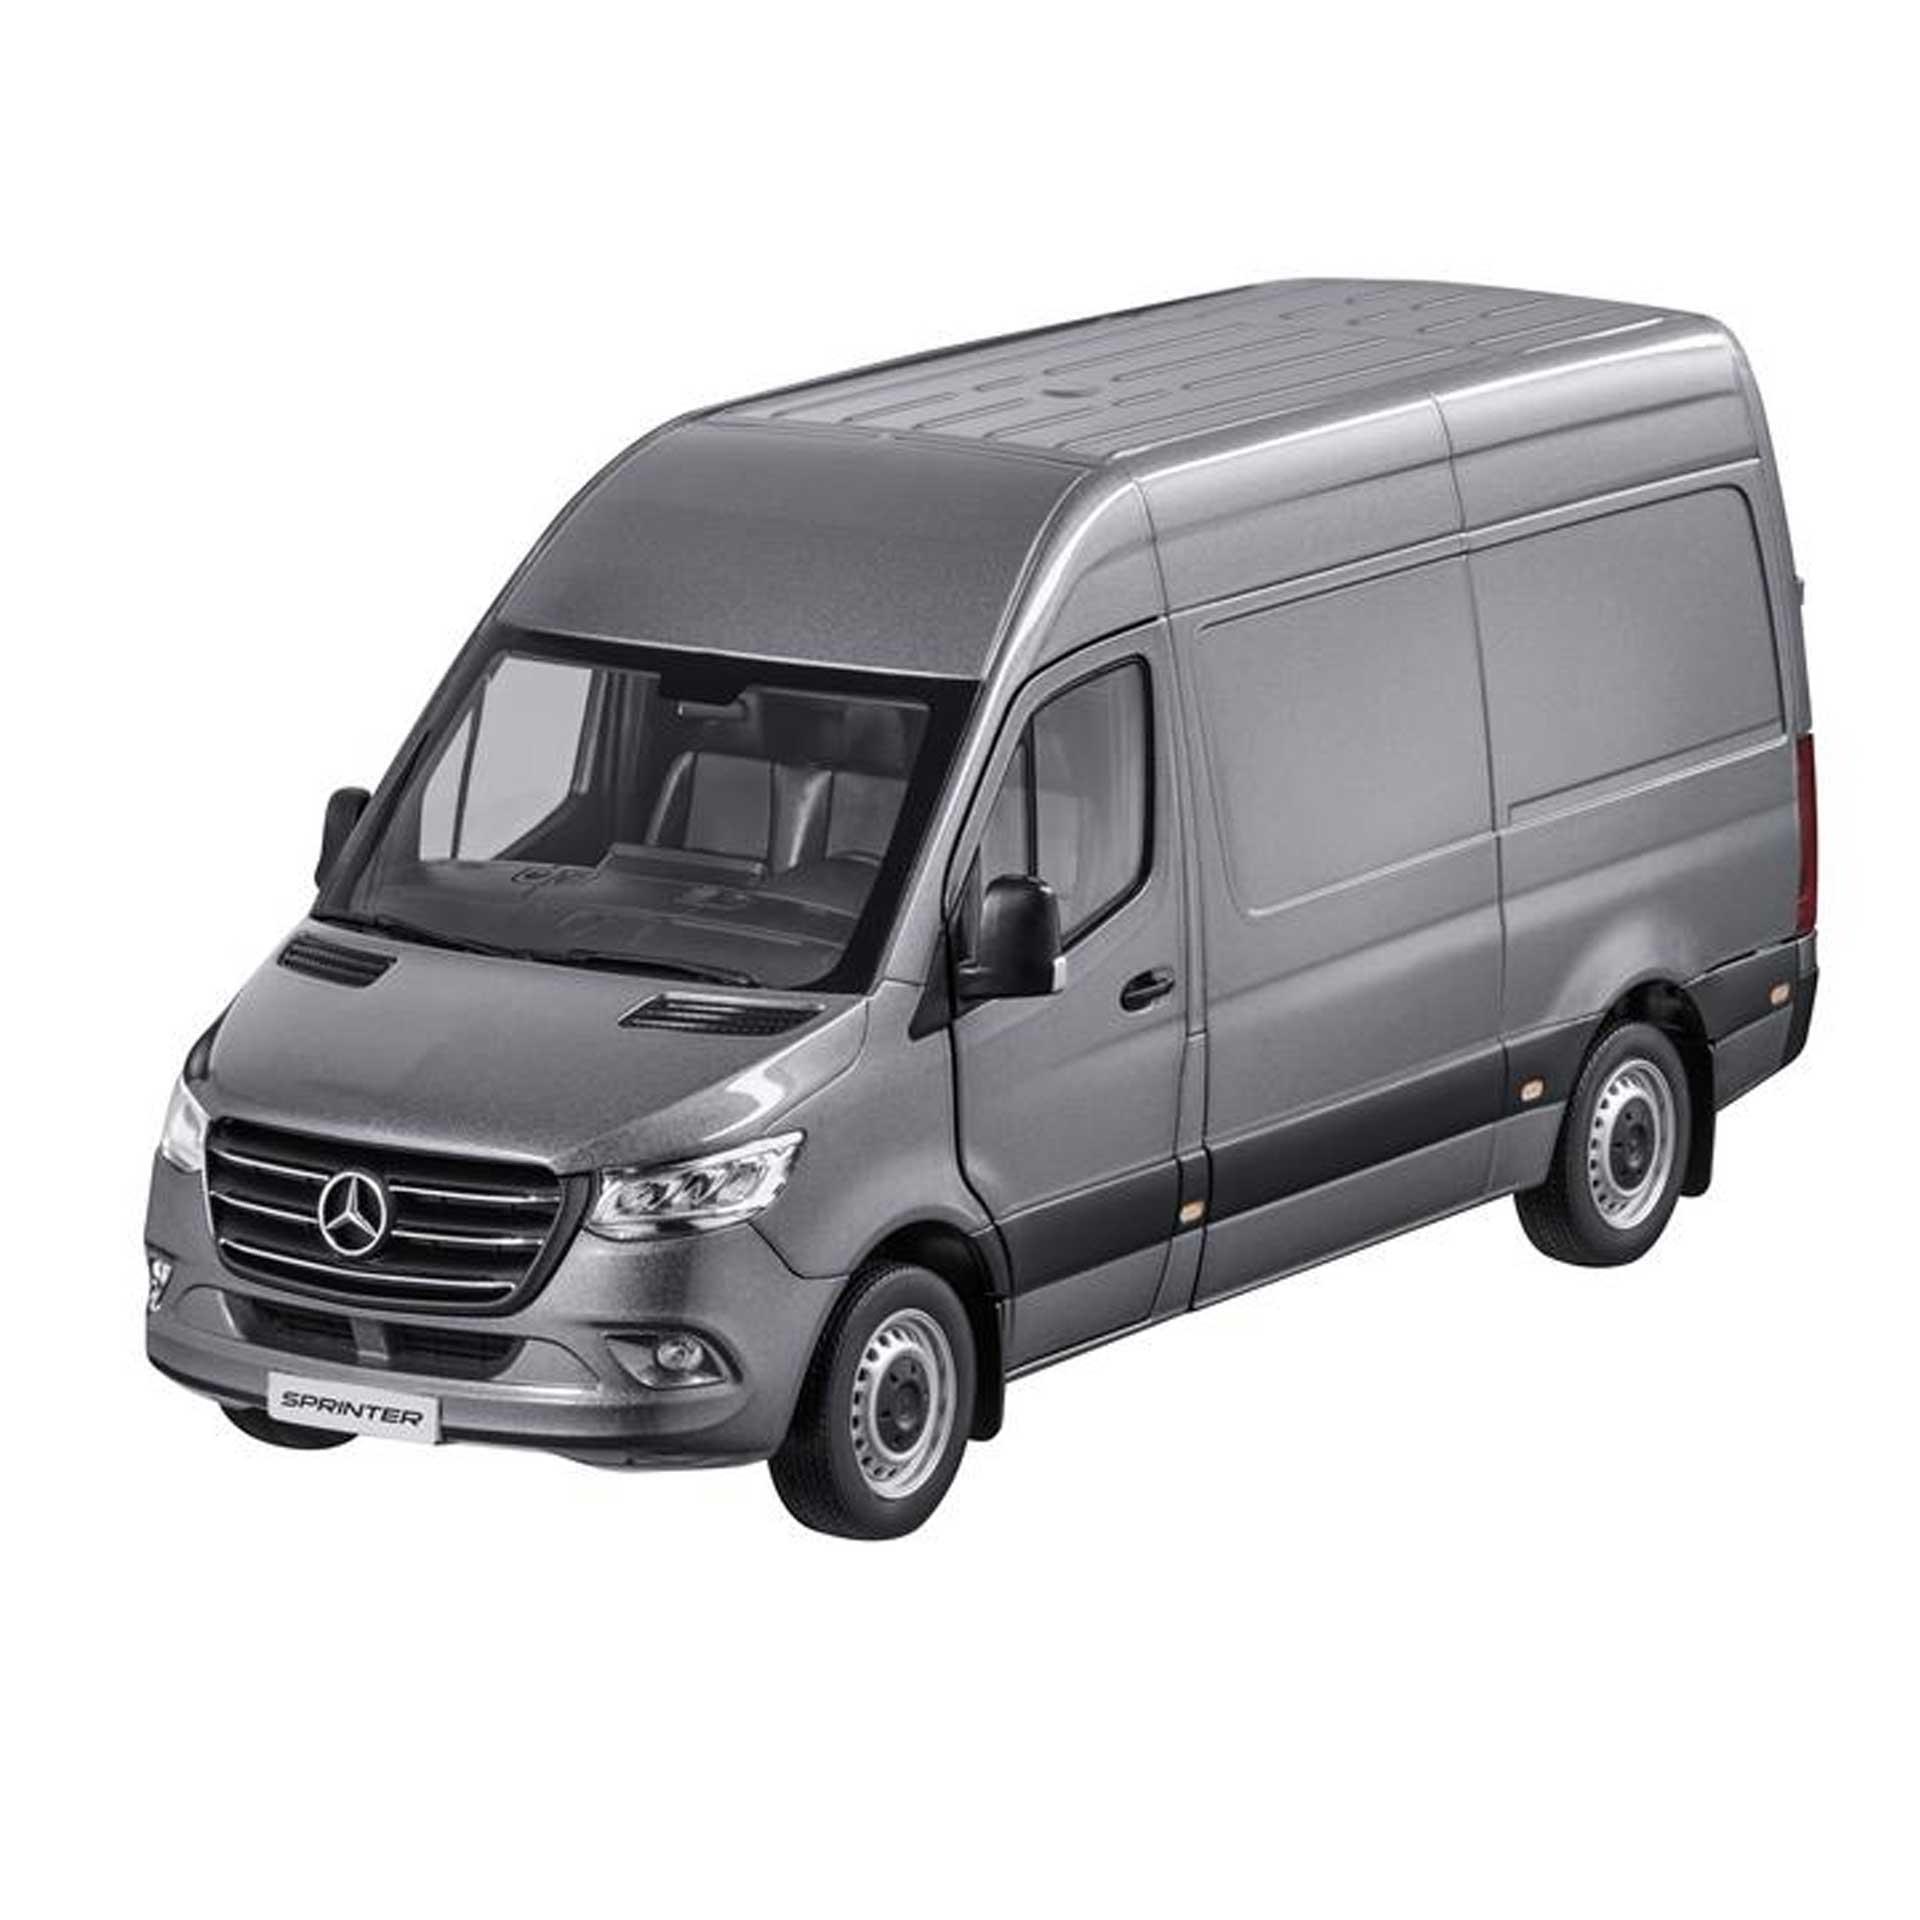 Mercedes-Benz Modellauto Sprinter Kastenwagen 1:18 designo selenitgrau magno metallic